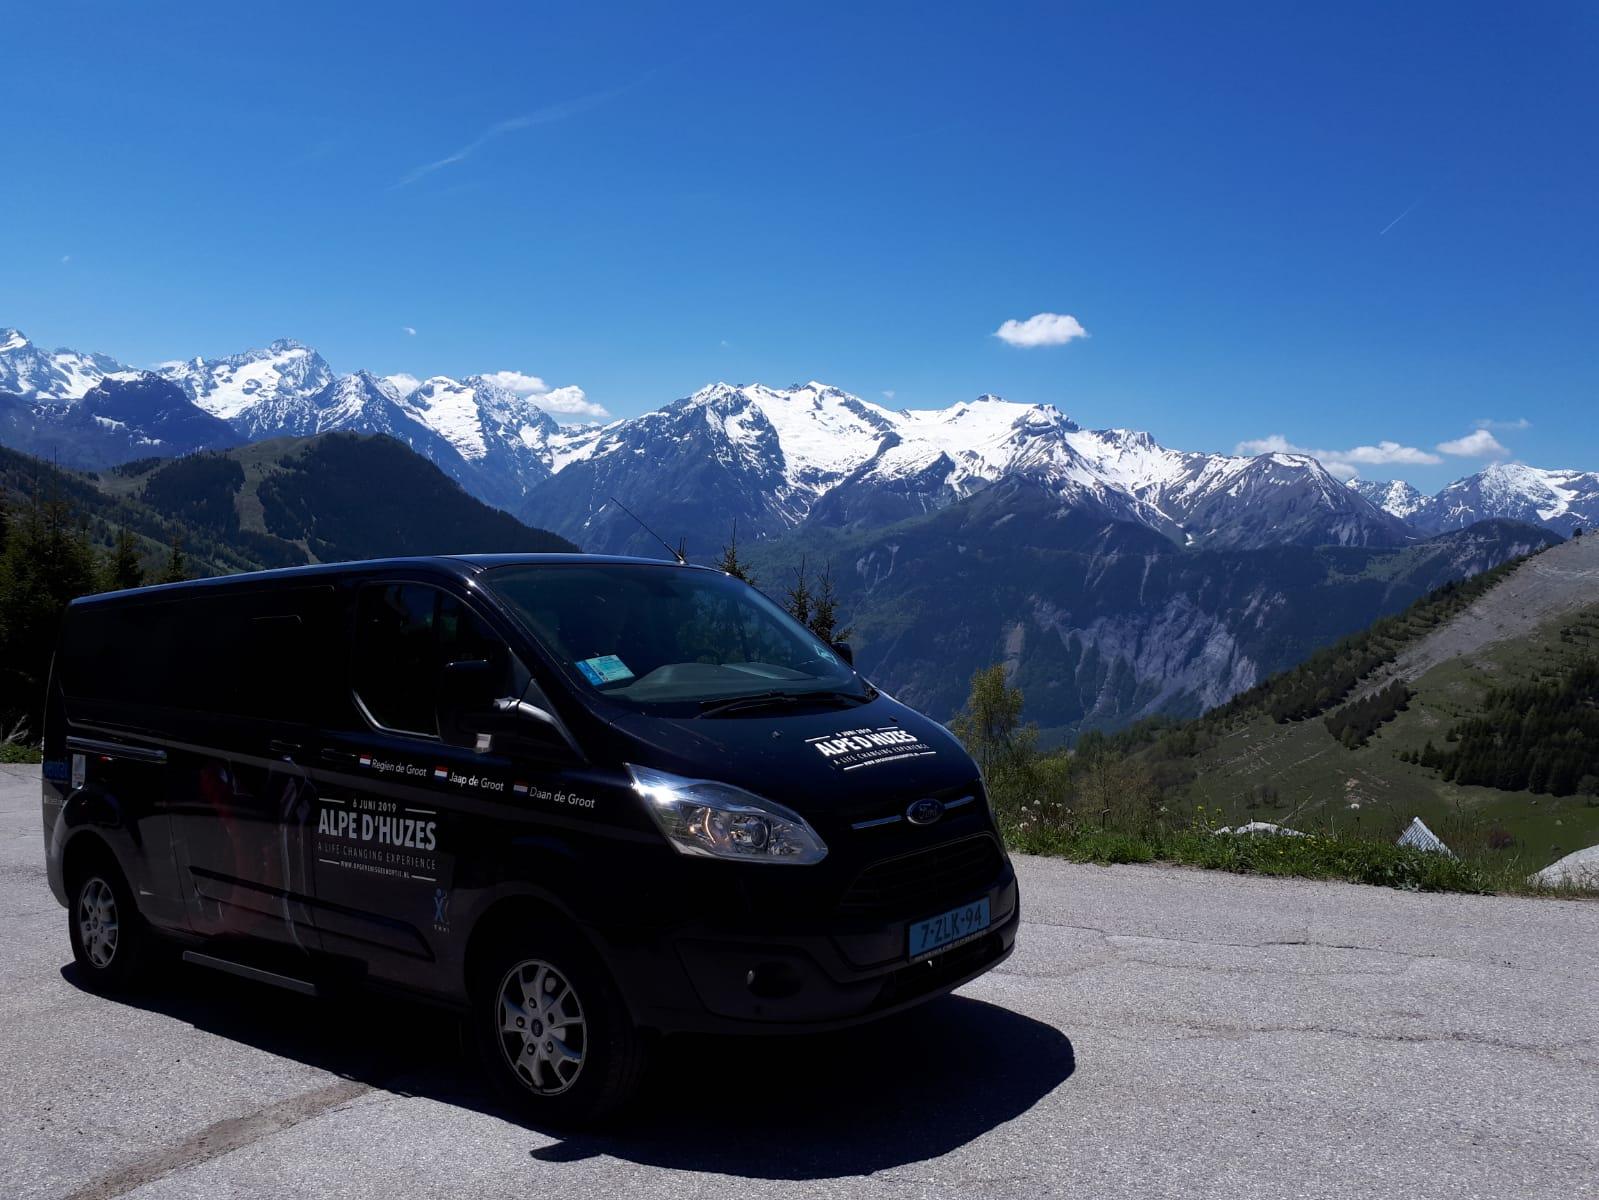 Sponsor Alpe d'huzes